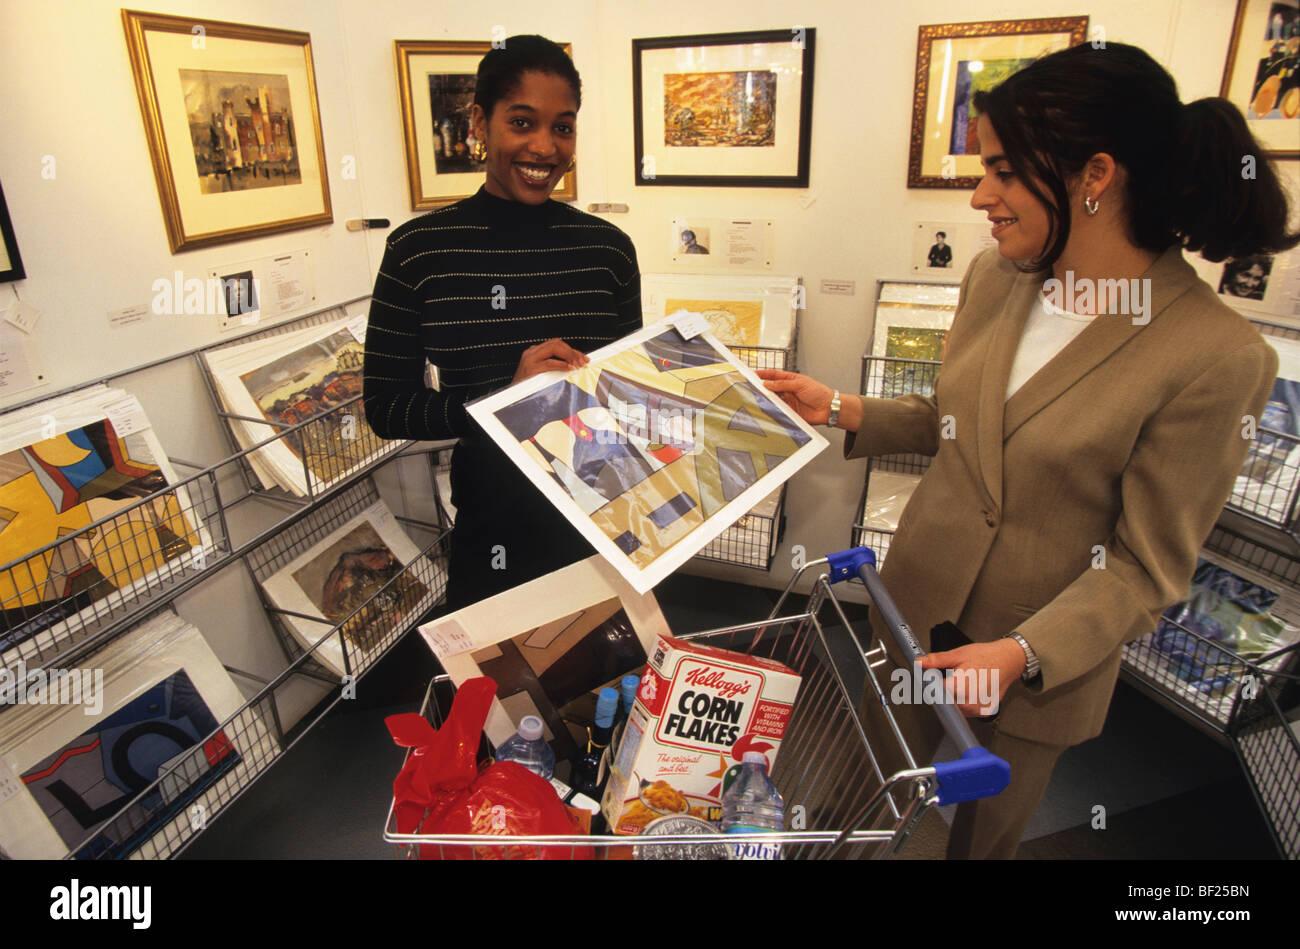 Buying art off the peg at Harvey Nicholls, London - Stock Image